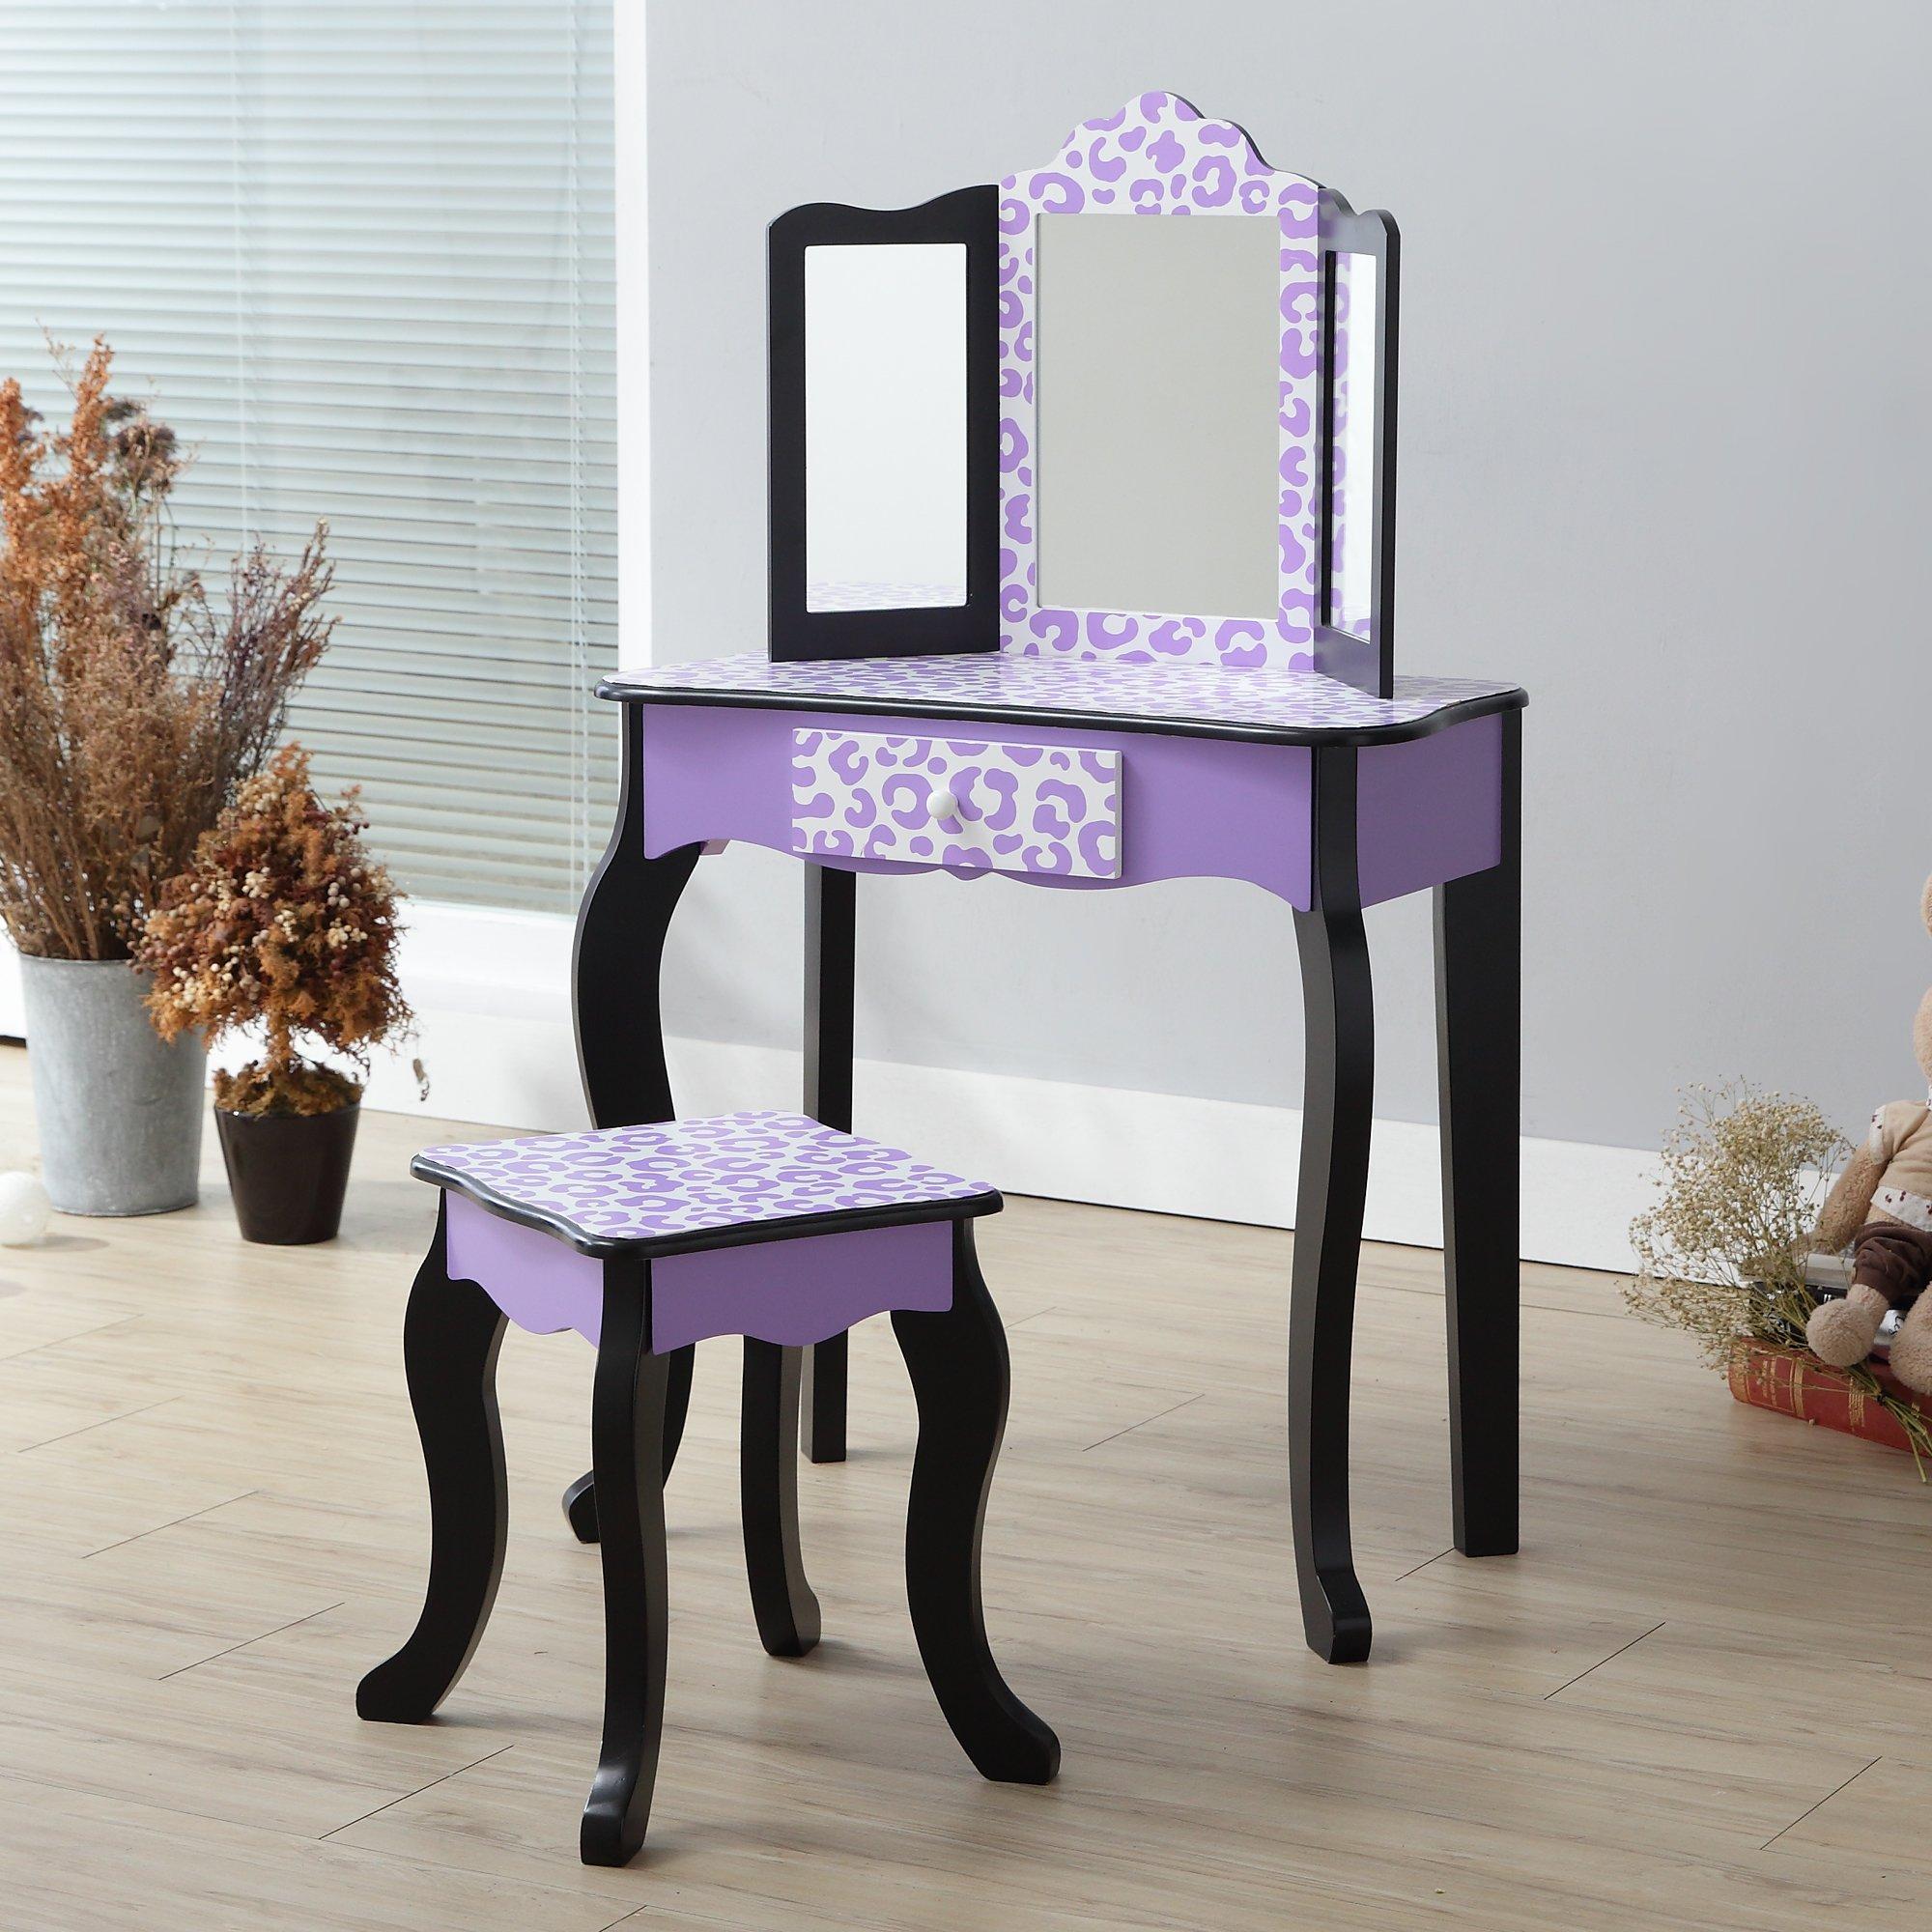 Teamson Kids Gisele Vanity Table and Stool Set, Purple / Leopard, T: 23.50x11.50x38.50 Small: 10.75x10.75x14.50